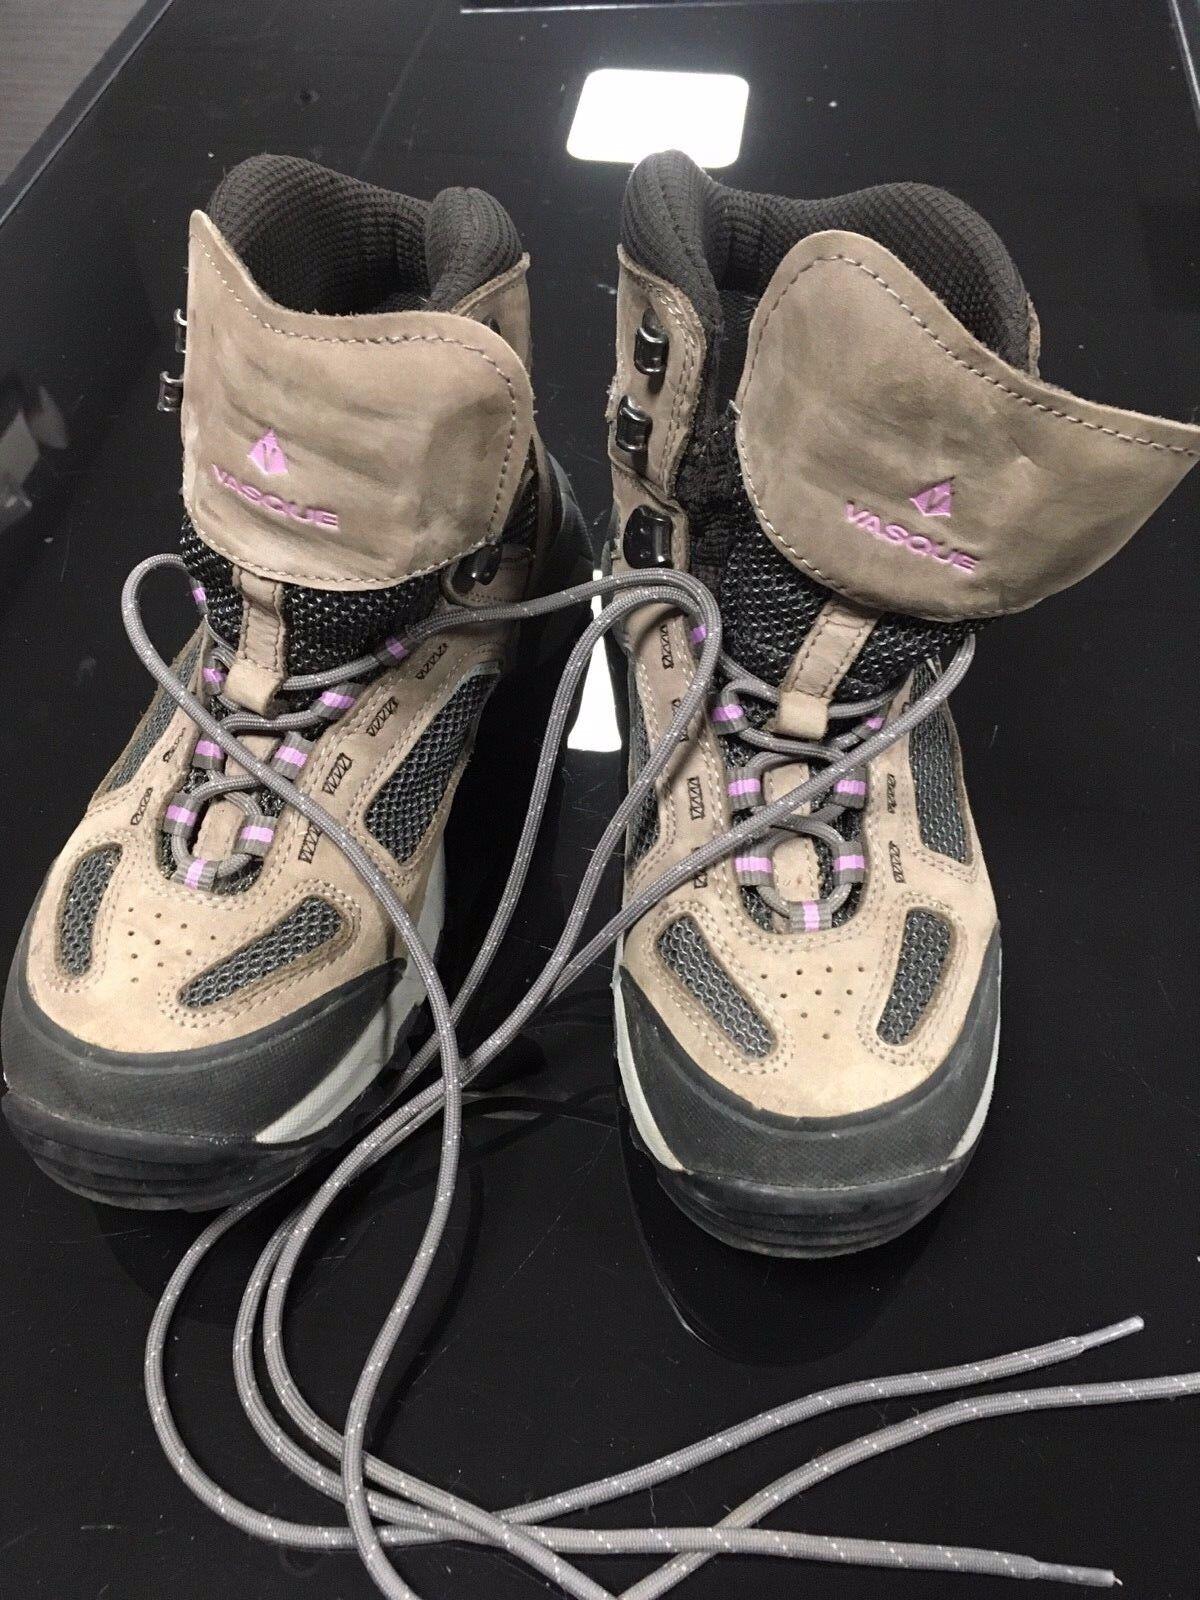 Vasque Women's Hiking Boots Size 8.5